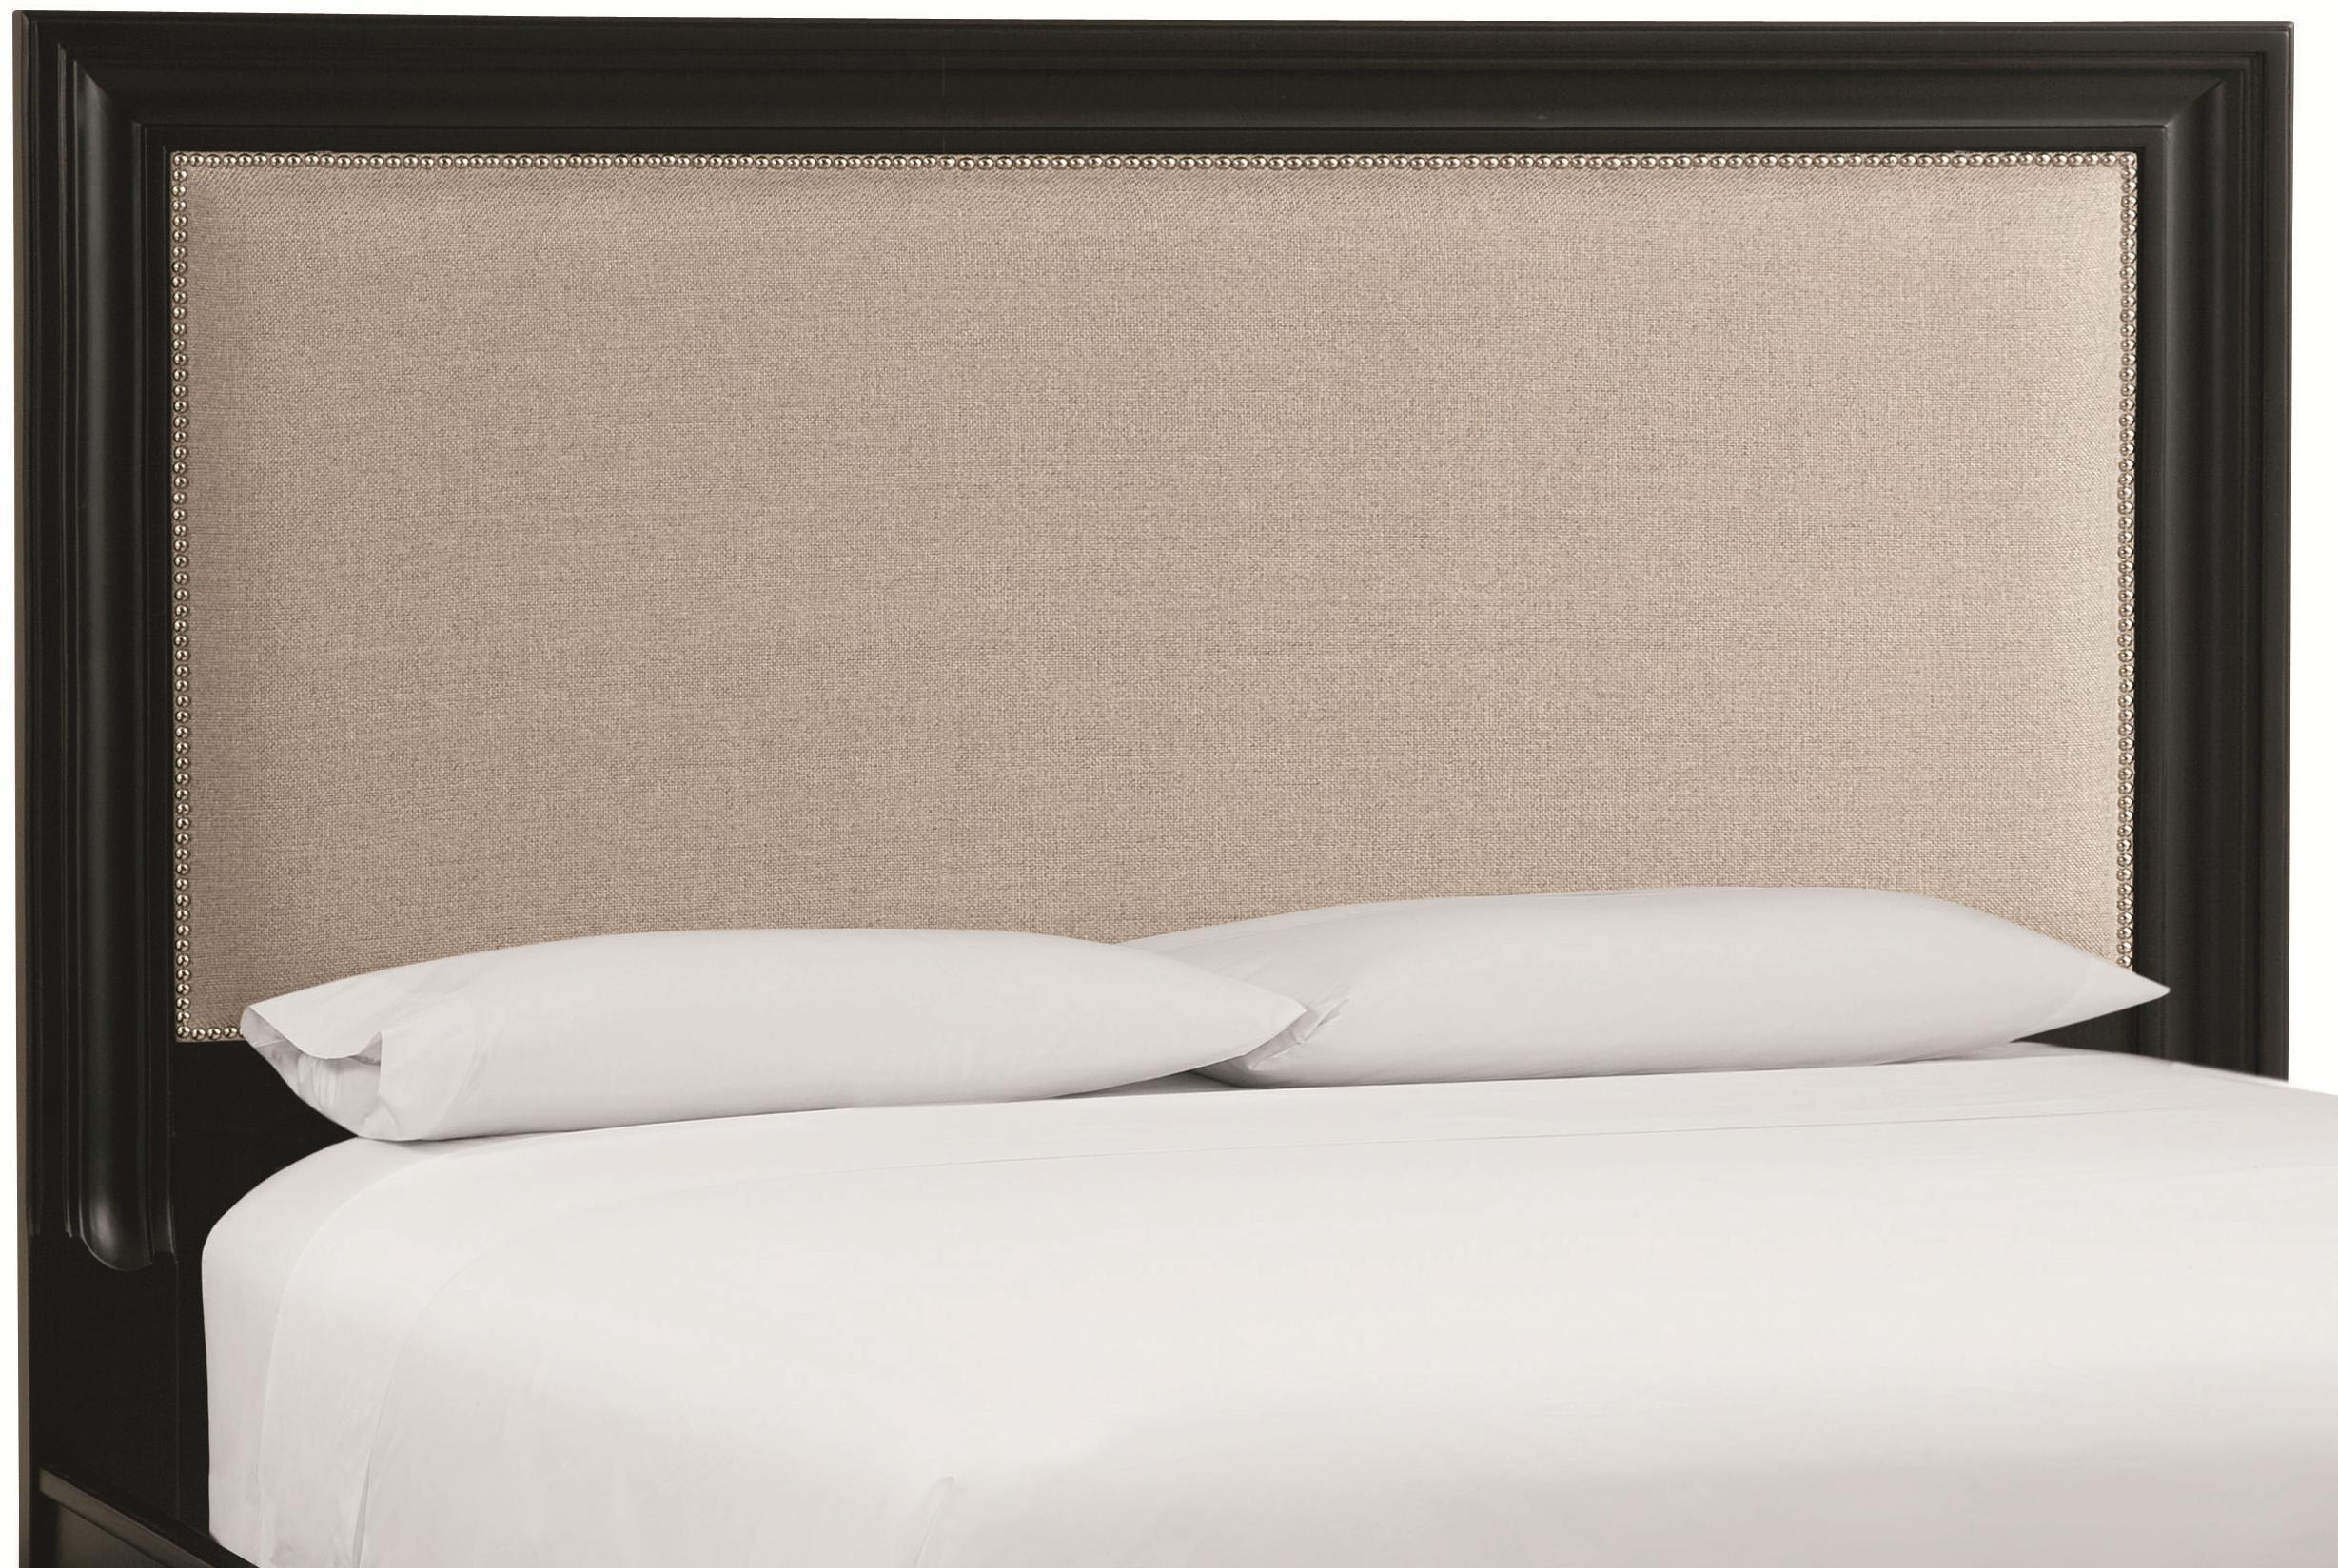 Thomasville® Manuscript Full Upholstered Headboard - Item Number: 82919-434